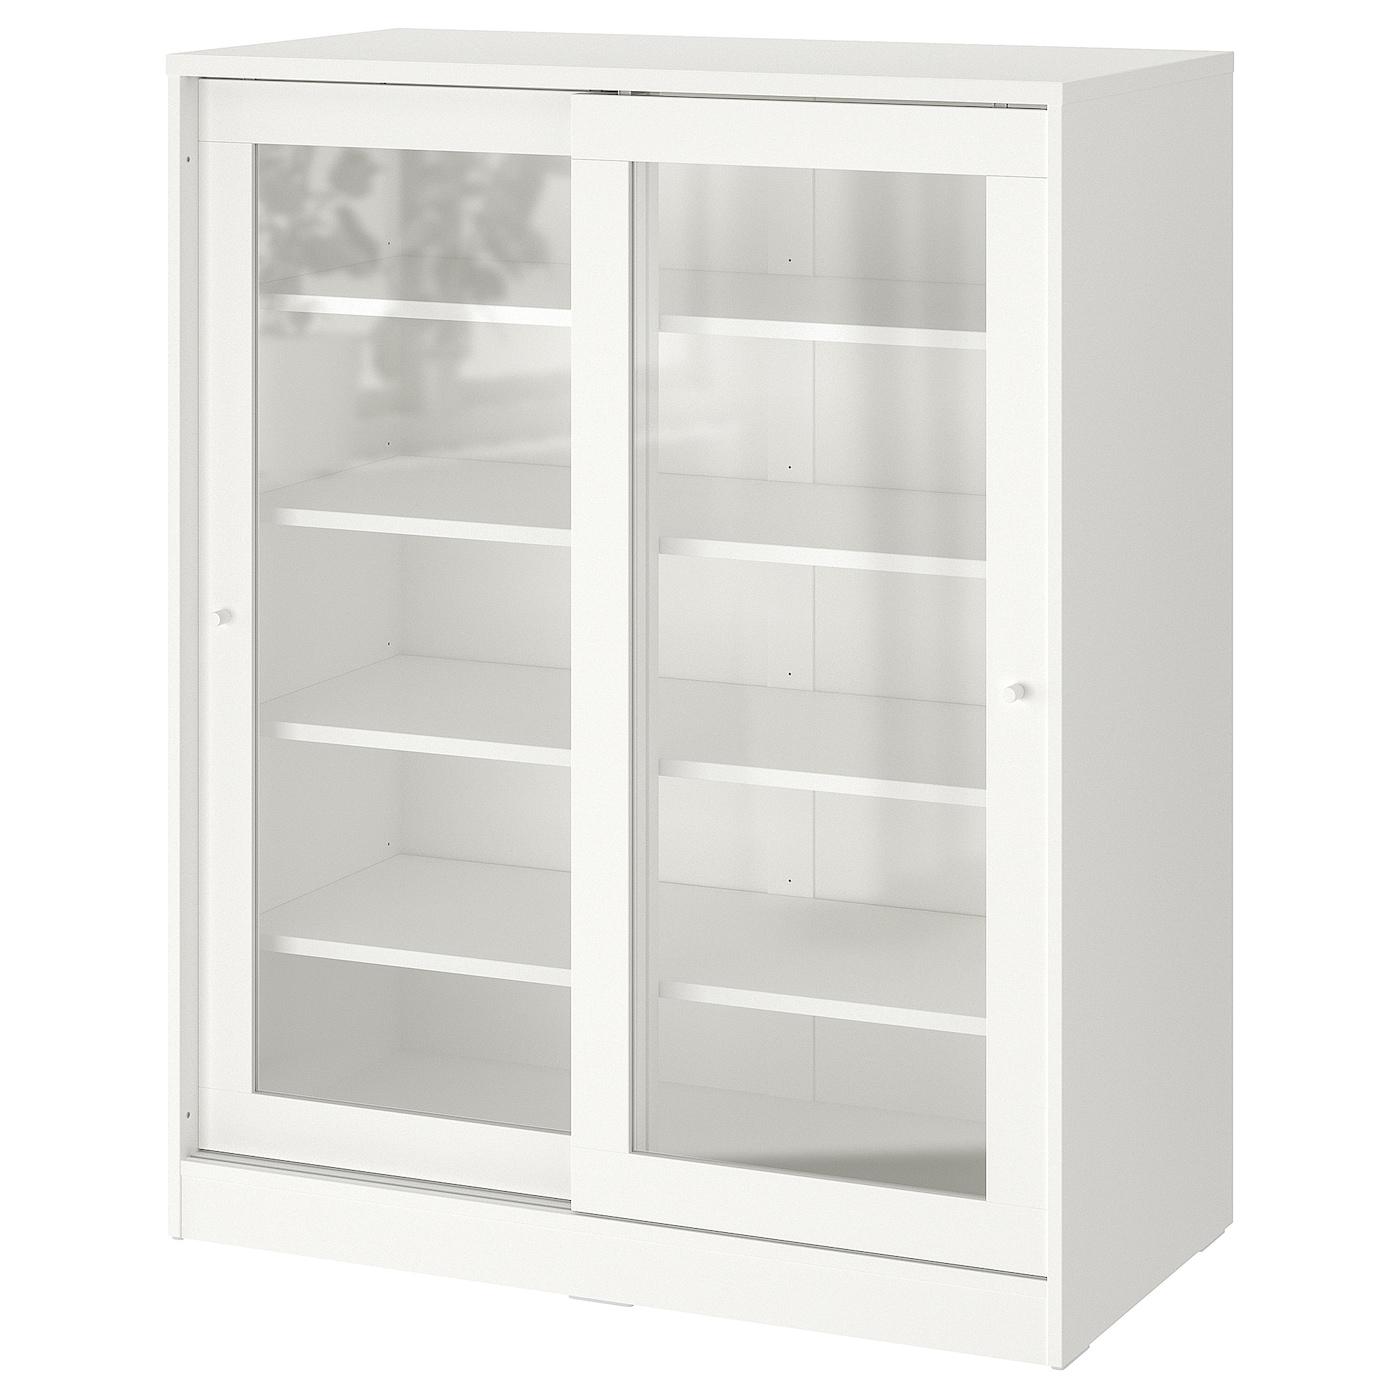 Syvde Rangement Avec Portes En Verre Blanc Ikea